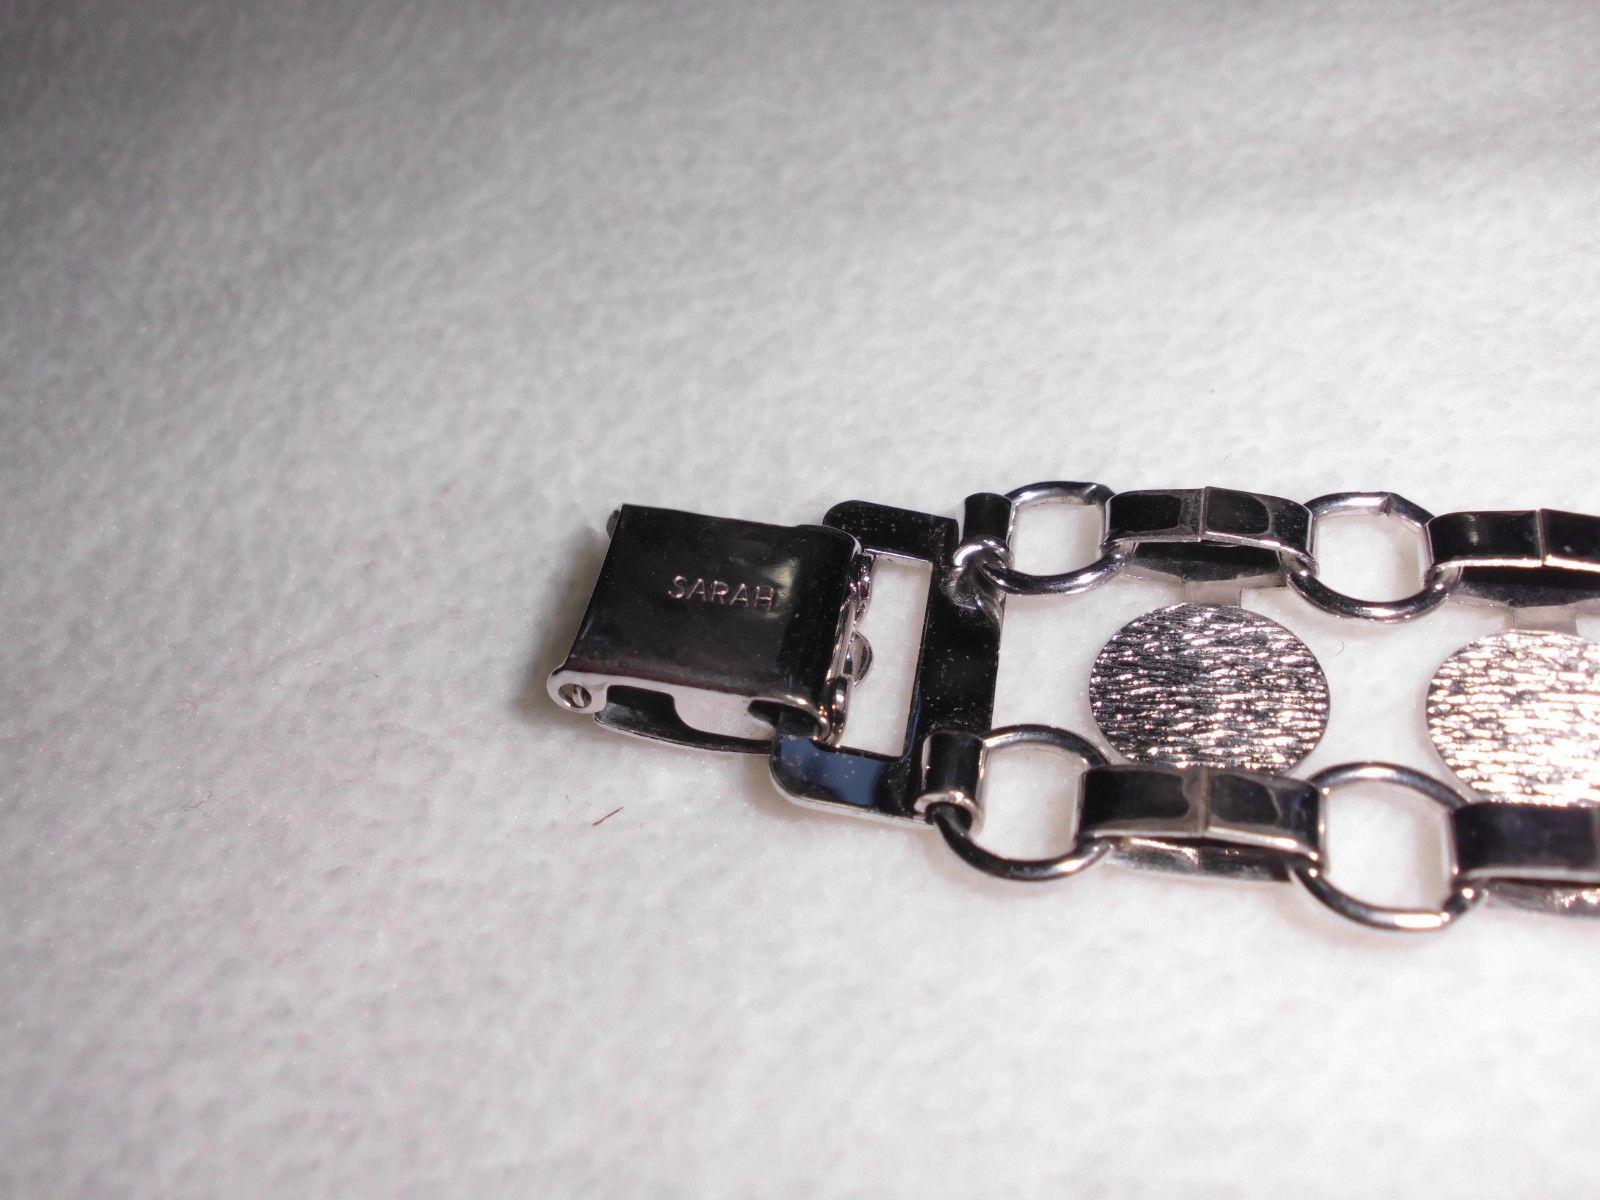 VTG SARAH Coventry Signed Silver Tone Open Work Circle Metal Bracelet